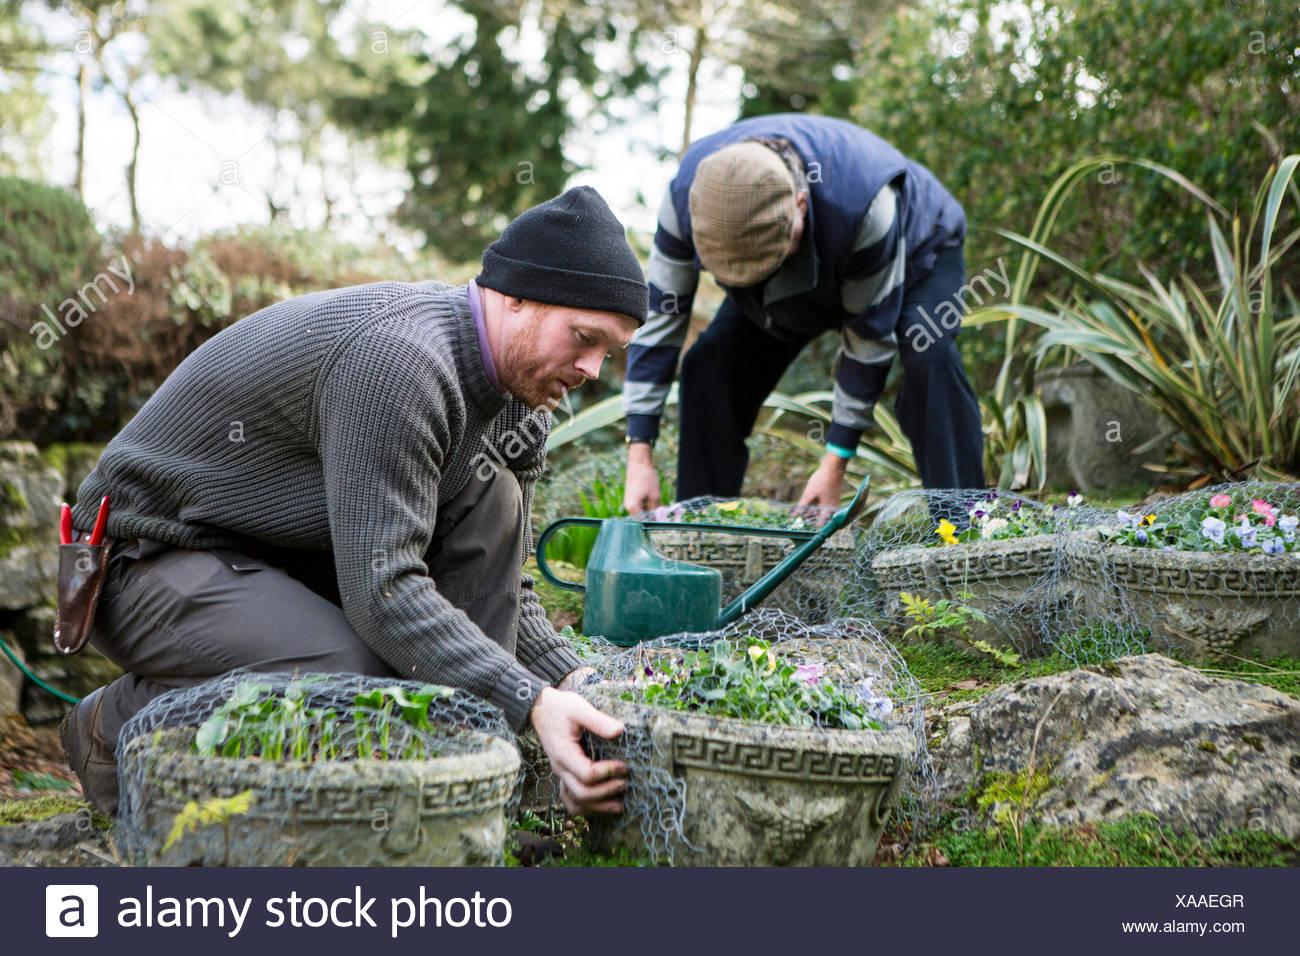 Two men working in garden, Bournemouth, County Dorset, UK, Europe - Stock Image